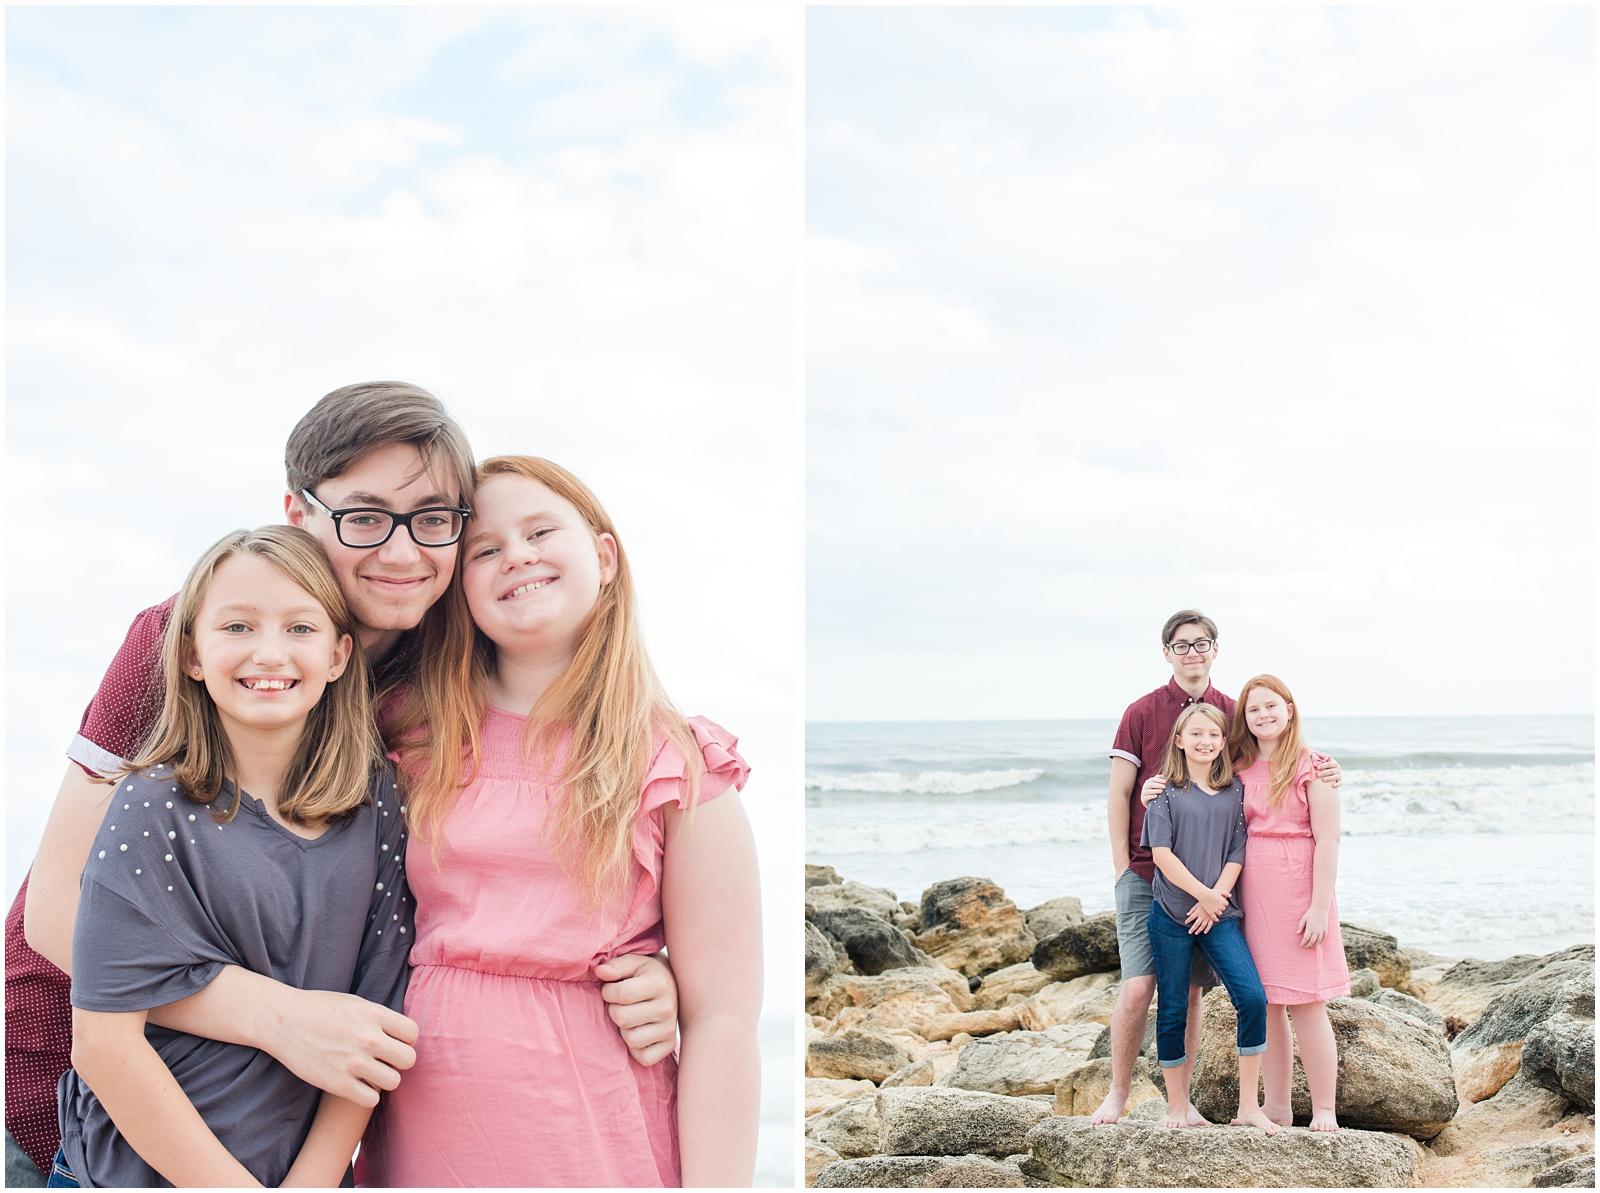 Washington Oaks_Garden_State Park_Beach_Family_Portraits_26.jpg